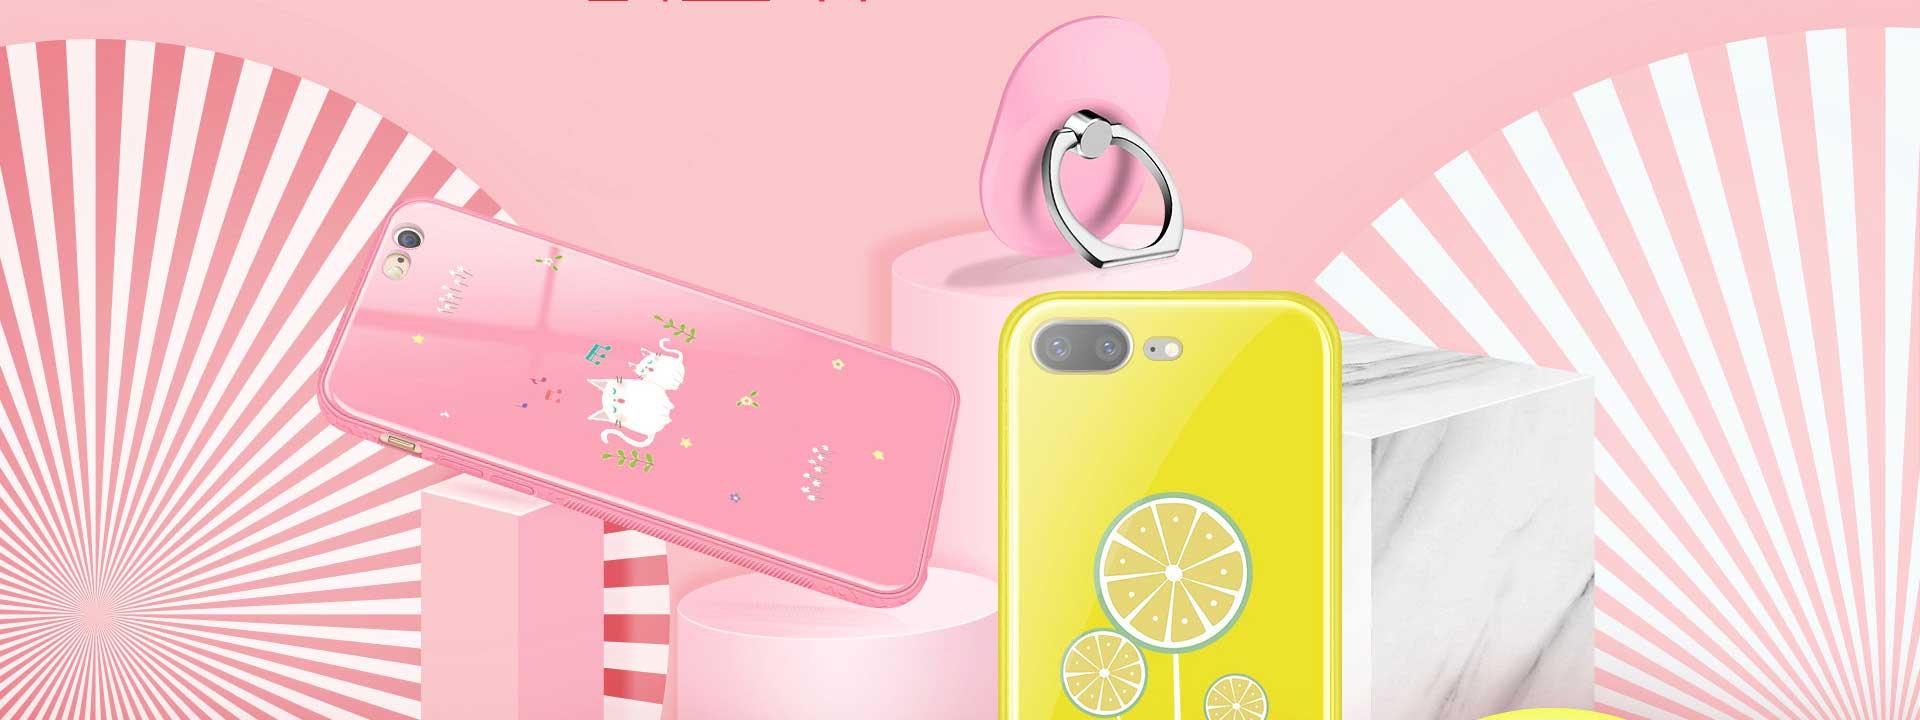 iPhone X Fodral Billig, iPhone 8 Plus Skal